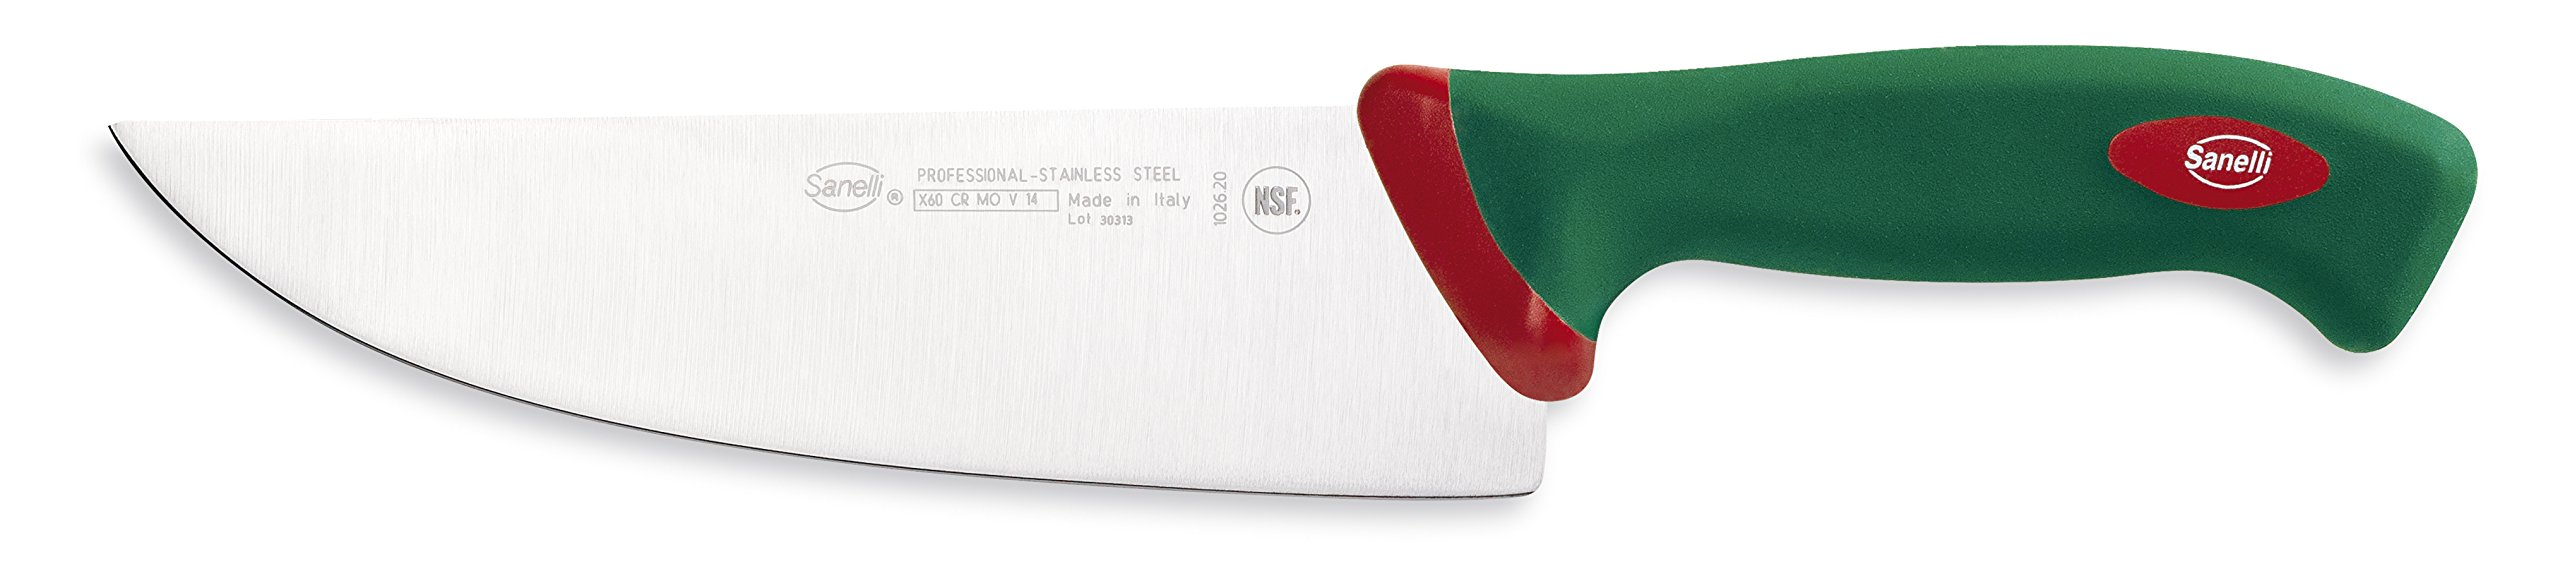 Sanelli Premana Professional Slicing Knife, 20cm/7.8'', Green by Sanelli